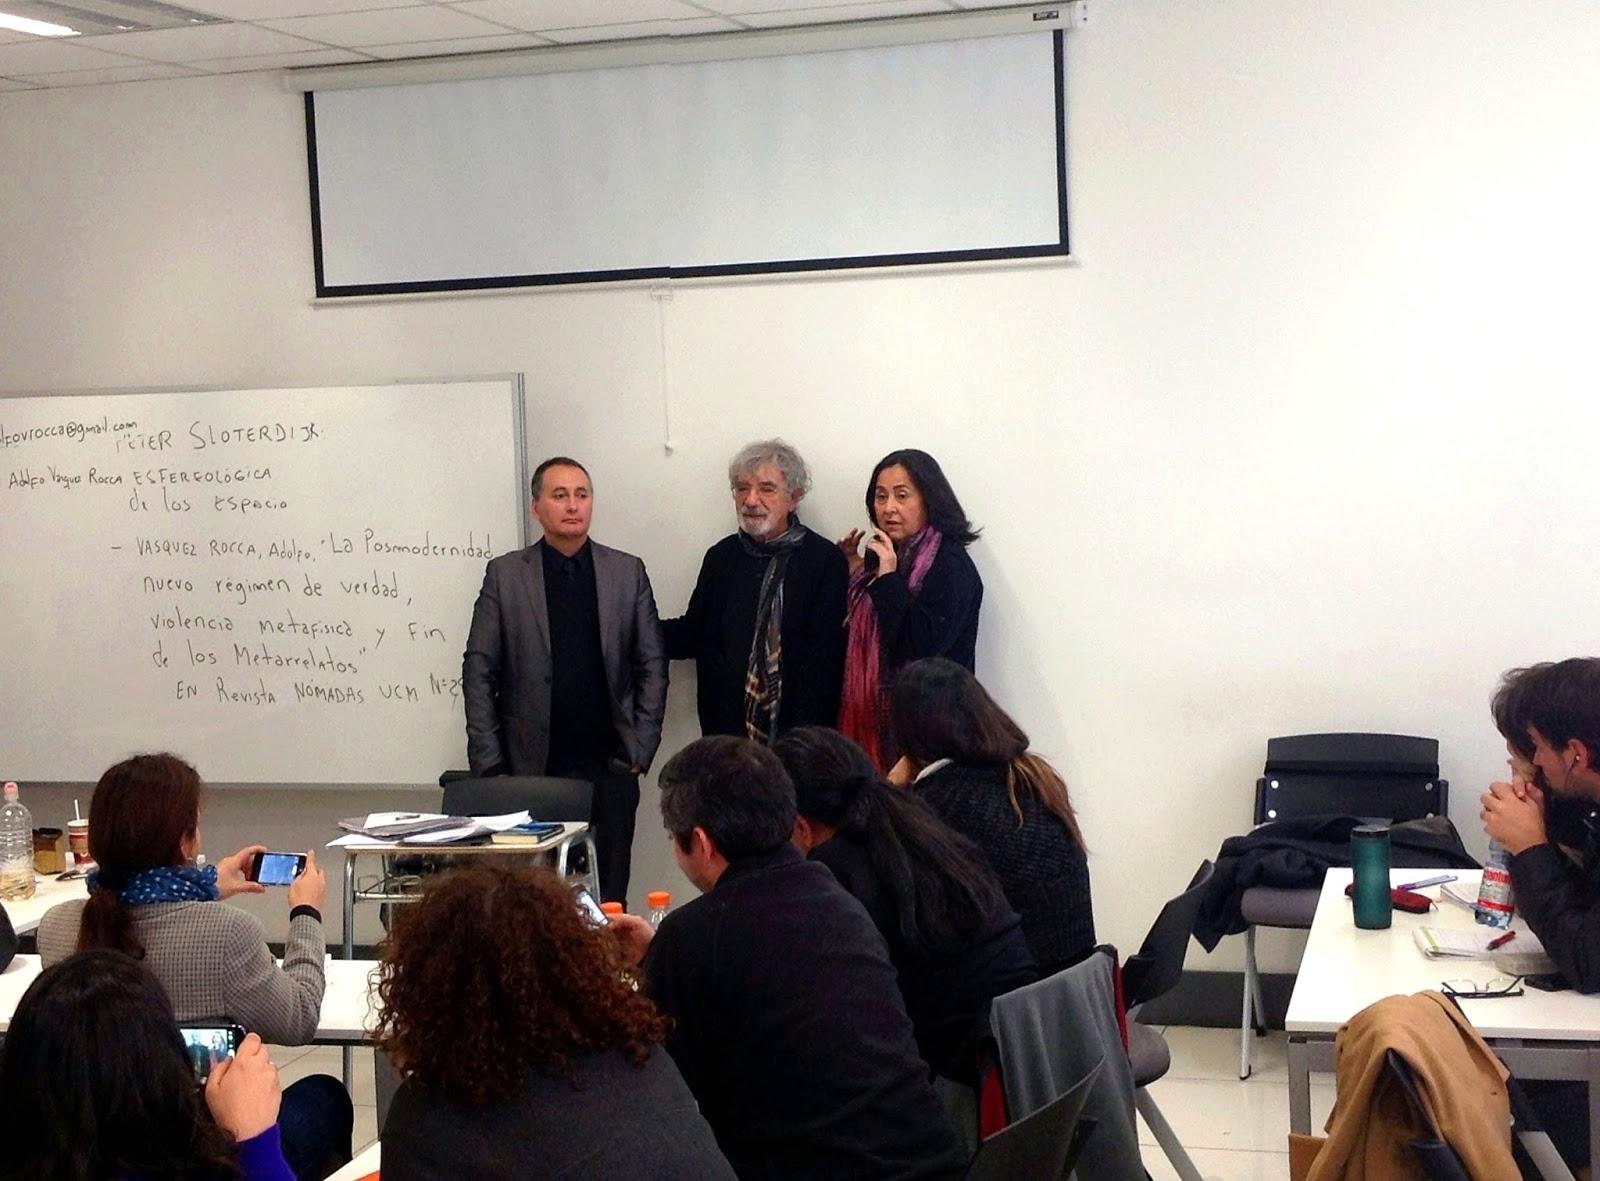 http://1.bp.blogspot.com/-qX7lbymXTWo/UharIke37iI/AAAAAAAAJvk/YDfr6Nt6JAg/s1600/Postgrado+Biologia+Cultural+II+_+Universidad+Mayor+y+Matriztica+_+Adolfo+V%C3%A1squez+Rocca+PHD.+_+Dr.+Humberto+Maturana+_+y+Ximena+Davila+_2013.jpeg